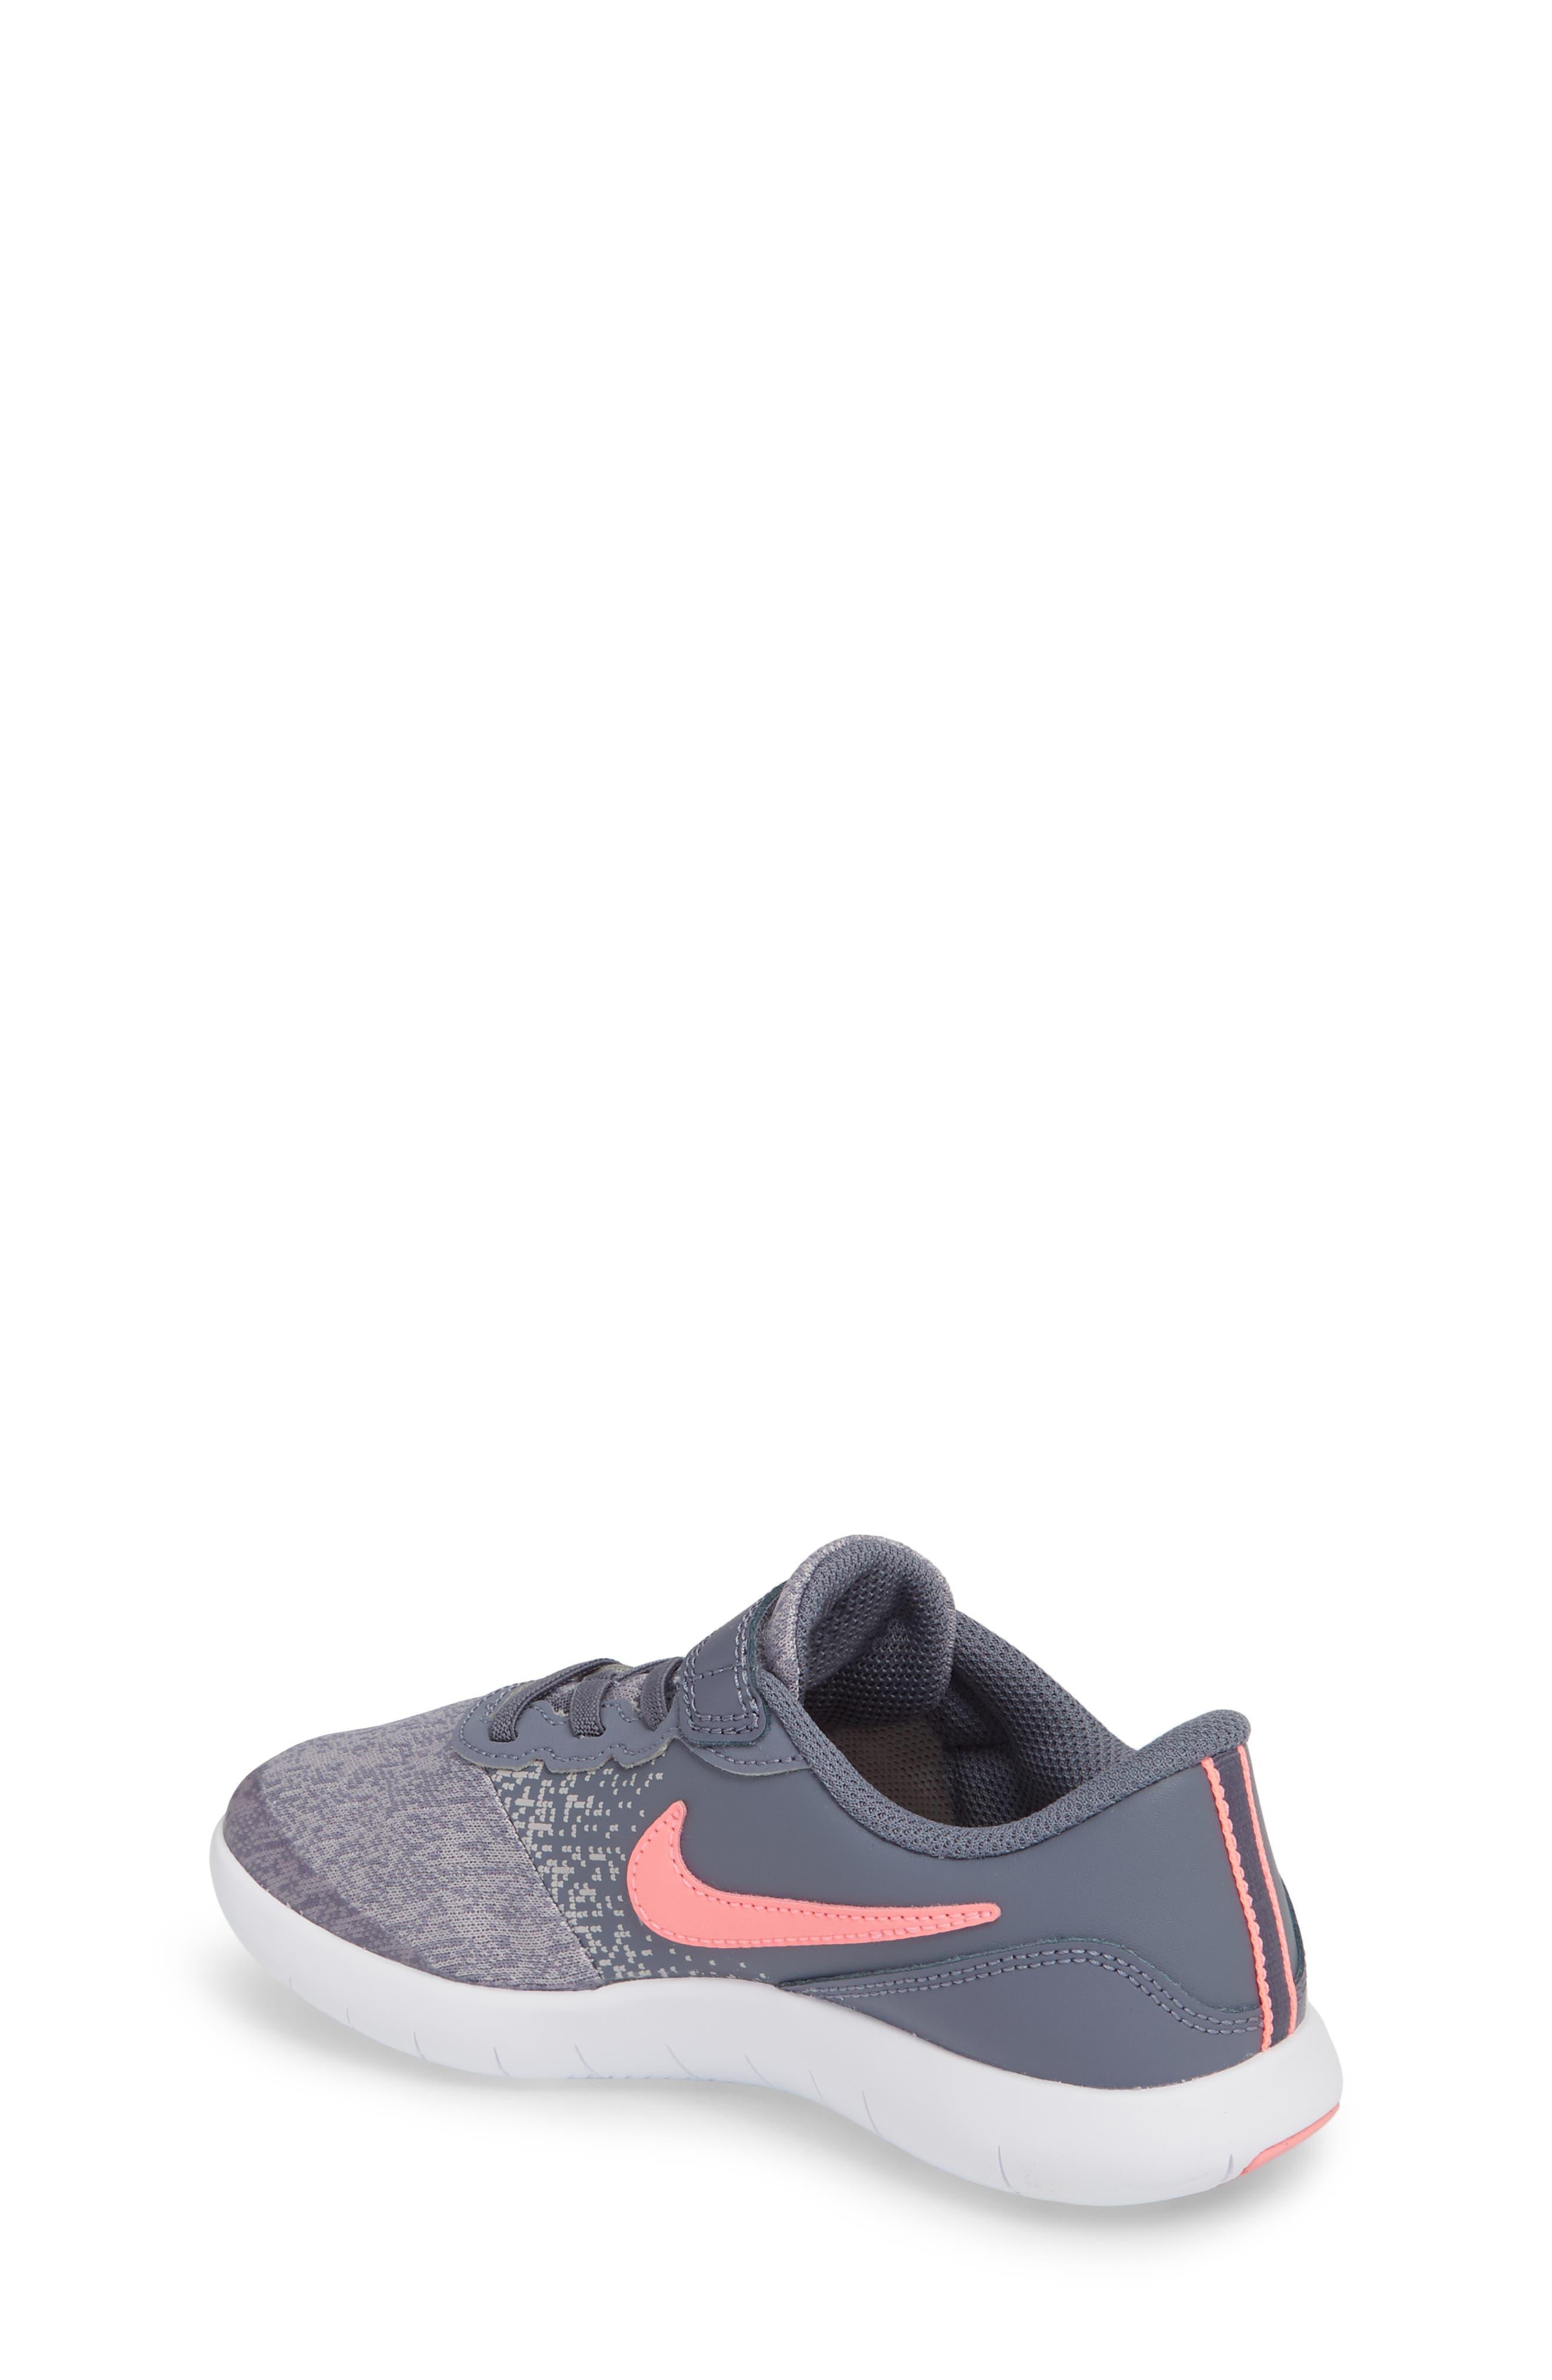 Flex Contact Running Shoe,                             Alternate thumbnail 2, color,                             LIGHT CARBON/ SUNSET PULSE